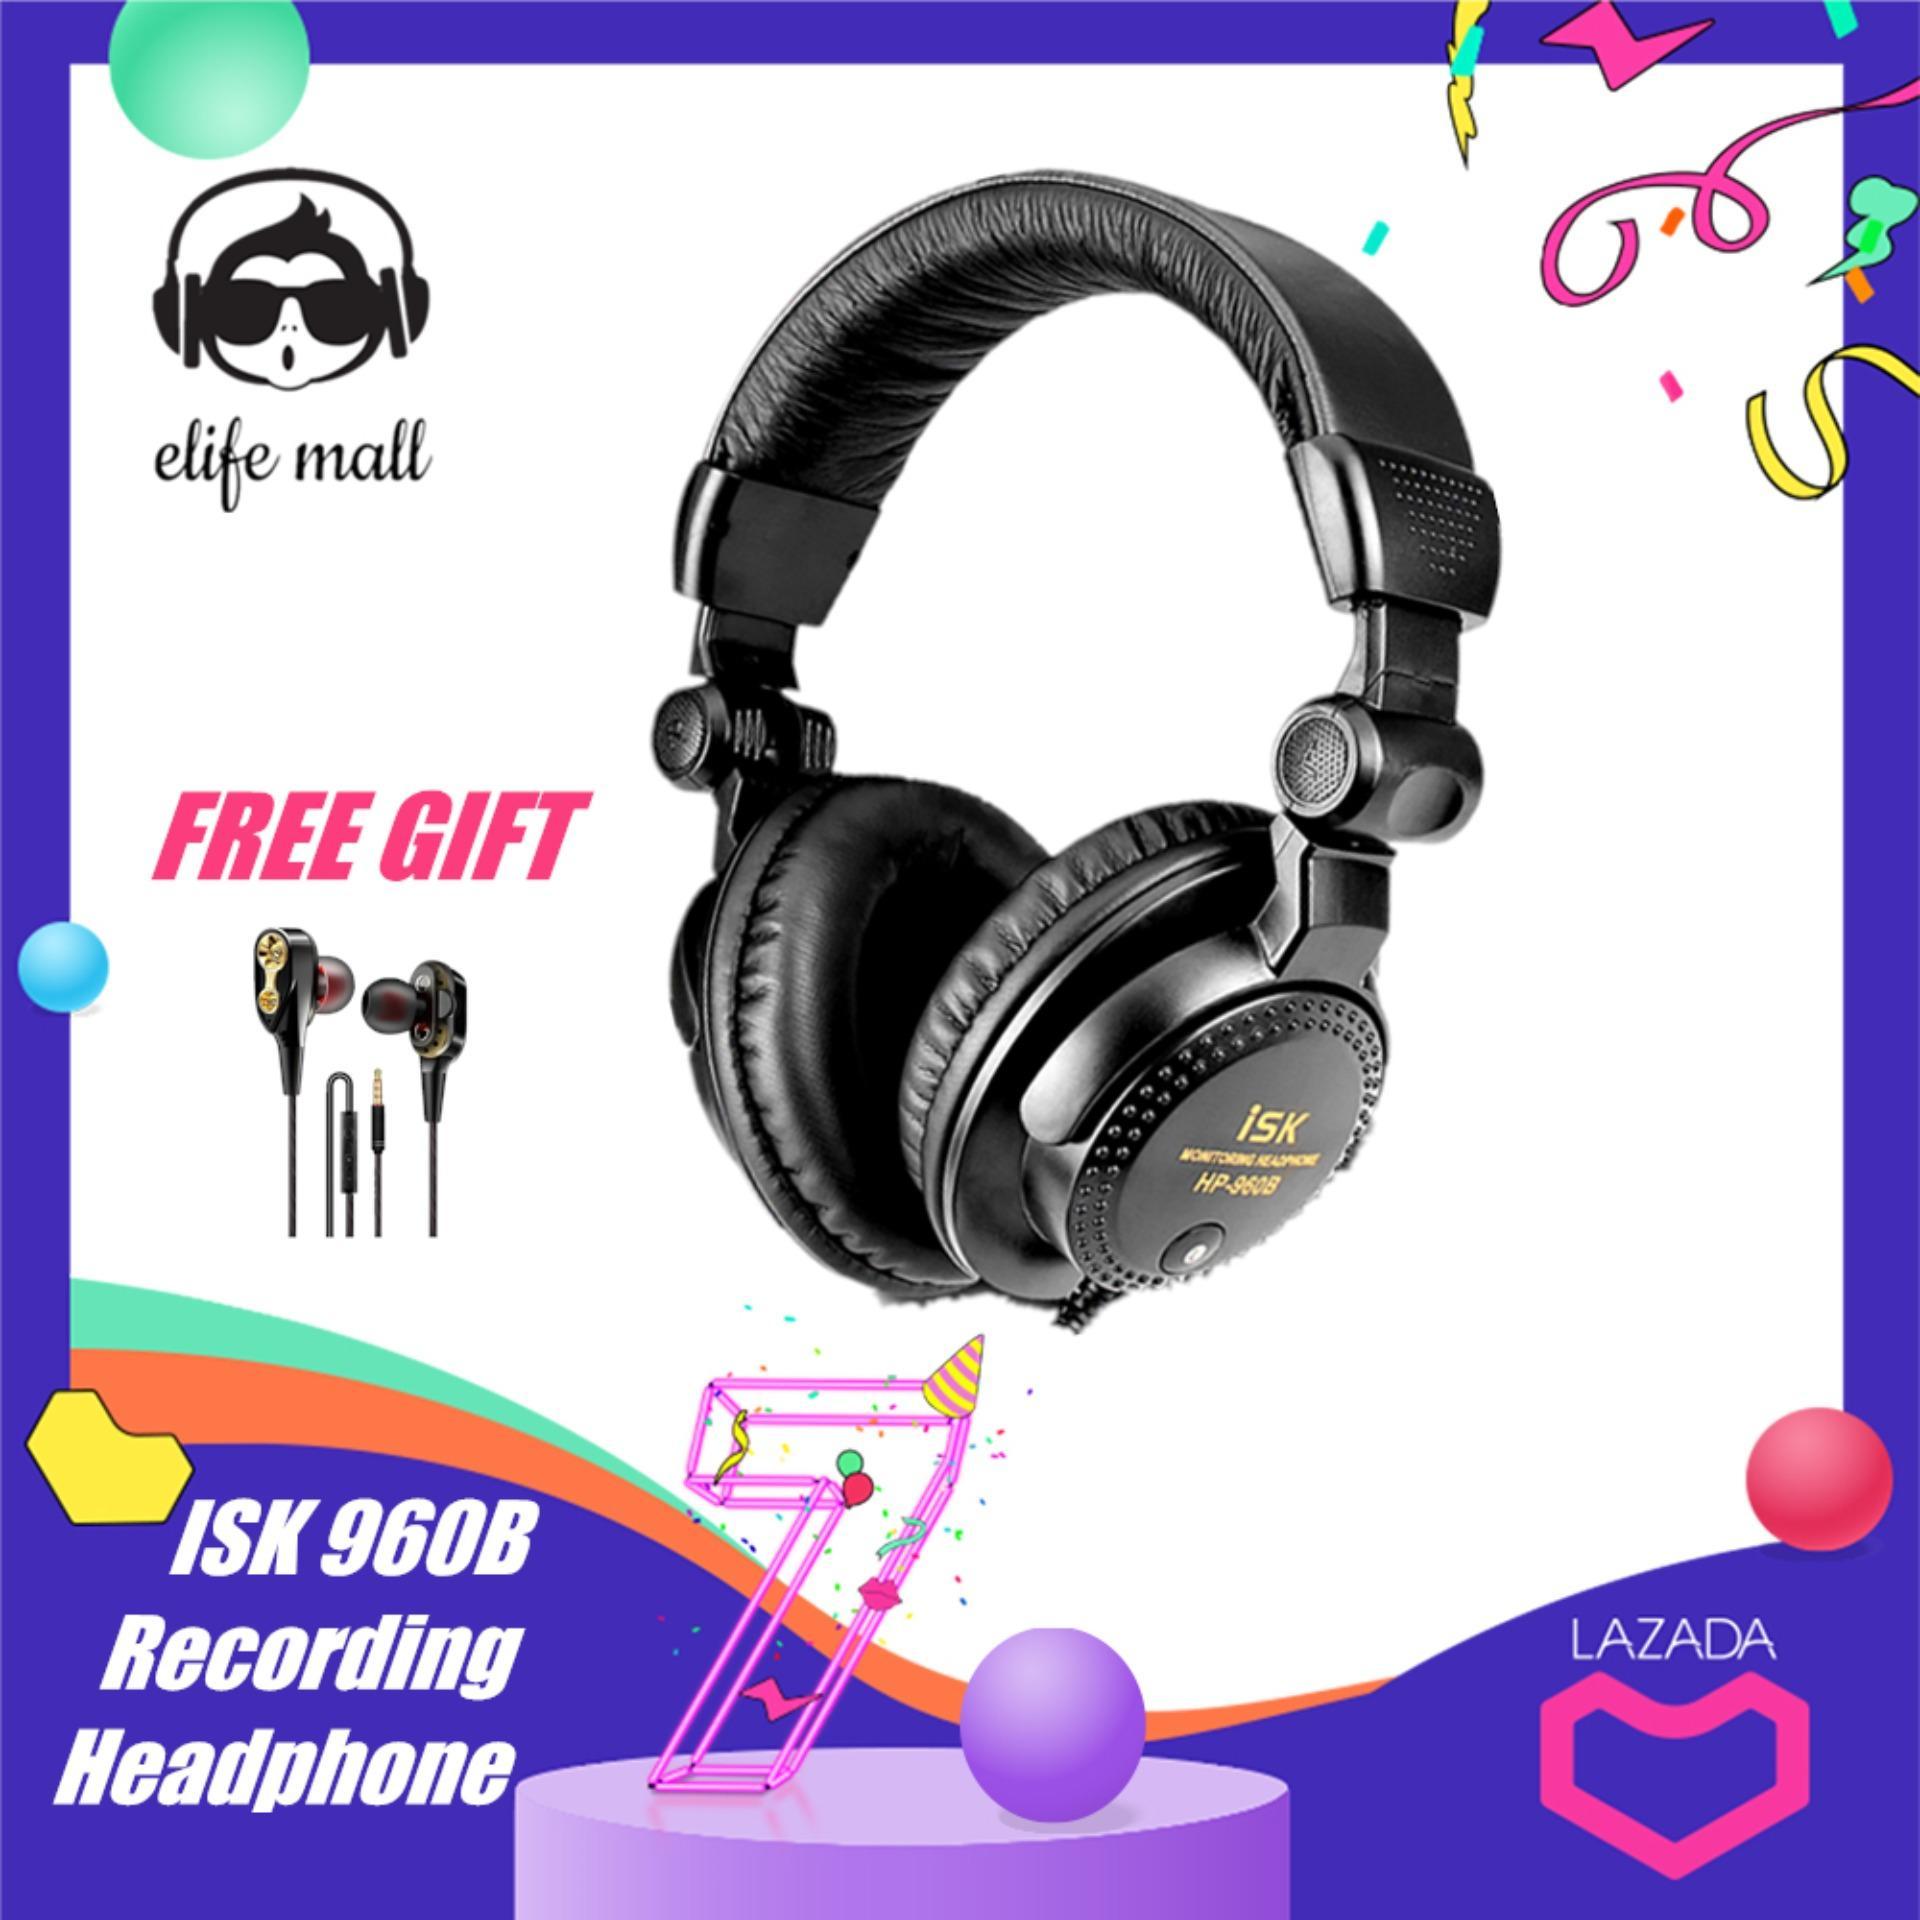 Rp 355.000. E-Hidup ISK 960B 3.5 Mm Plug Kabel Foldable Over-The-Ear Headset Stereo ...